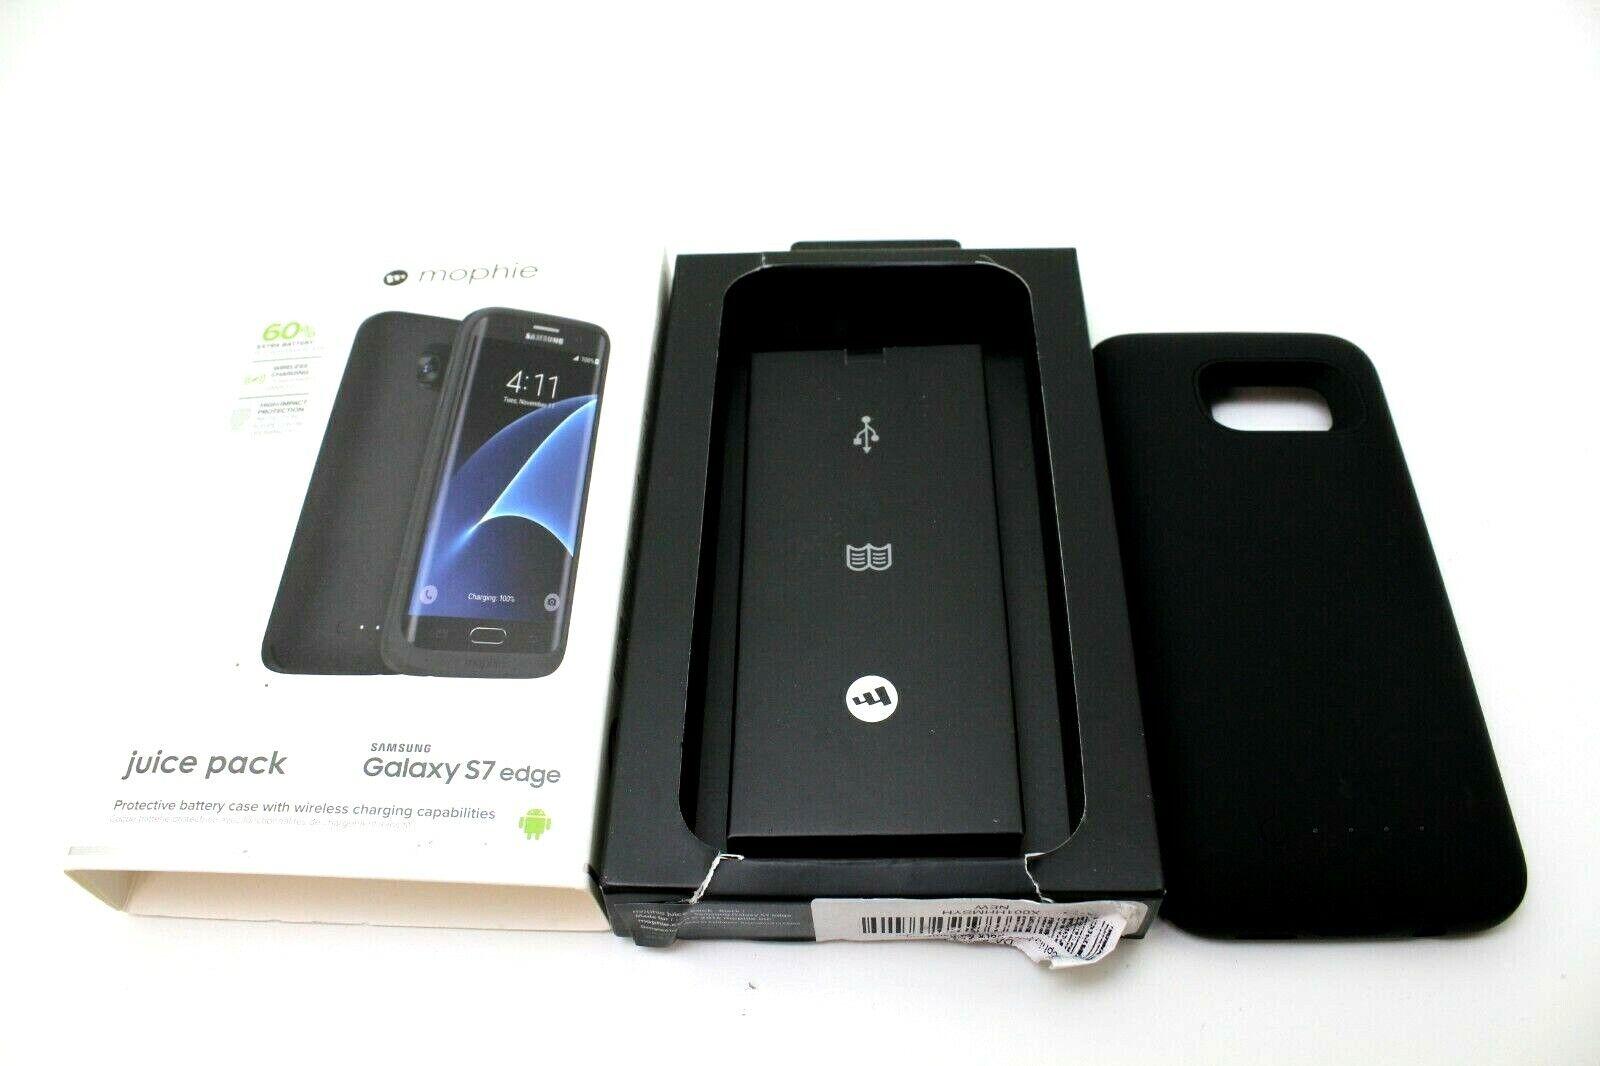 Powerbear Samsung Galaxy S7 Edge Battery Case With 4500 Mah Capacity Galaxy For Sale Online Ebay